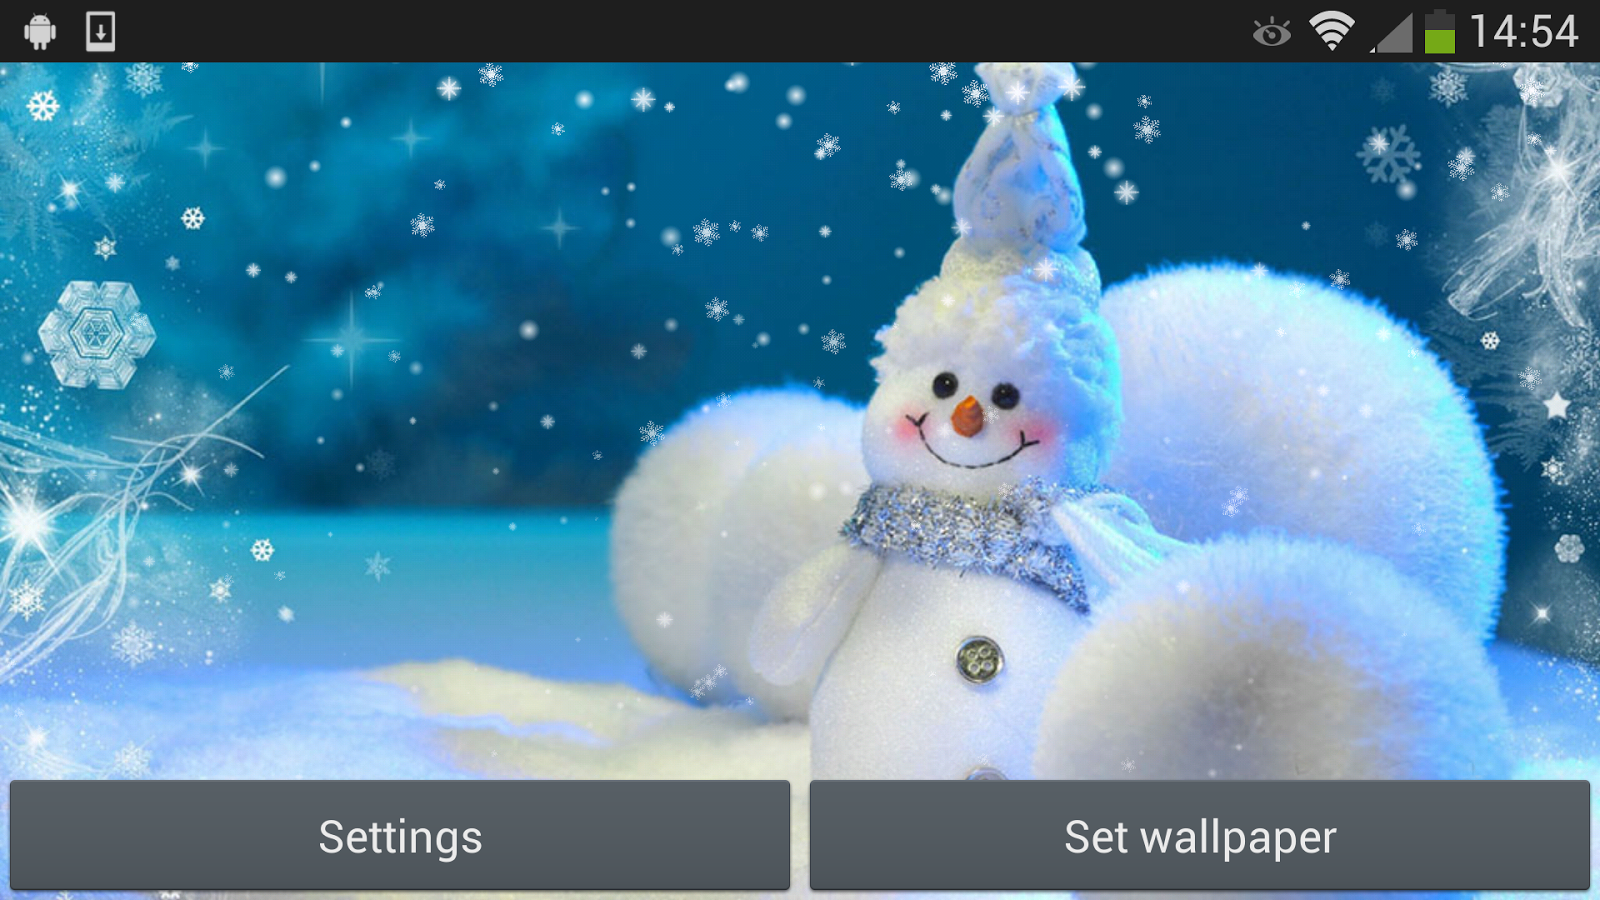 Christmas Snowman v1.4 .apk File